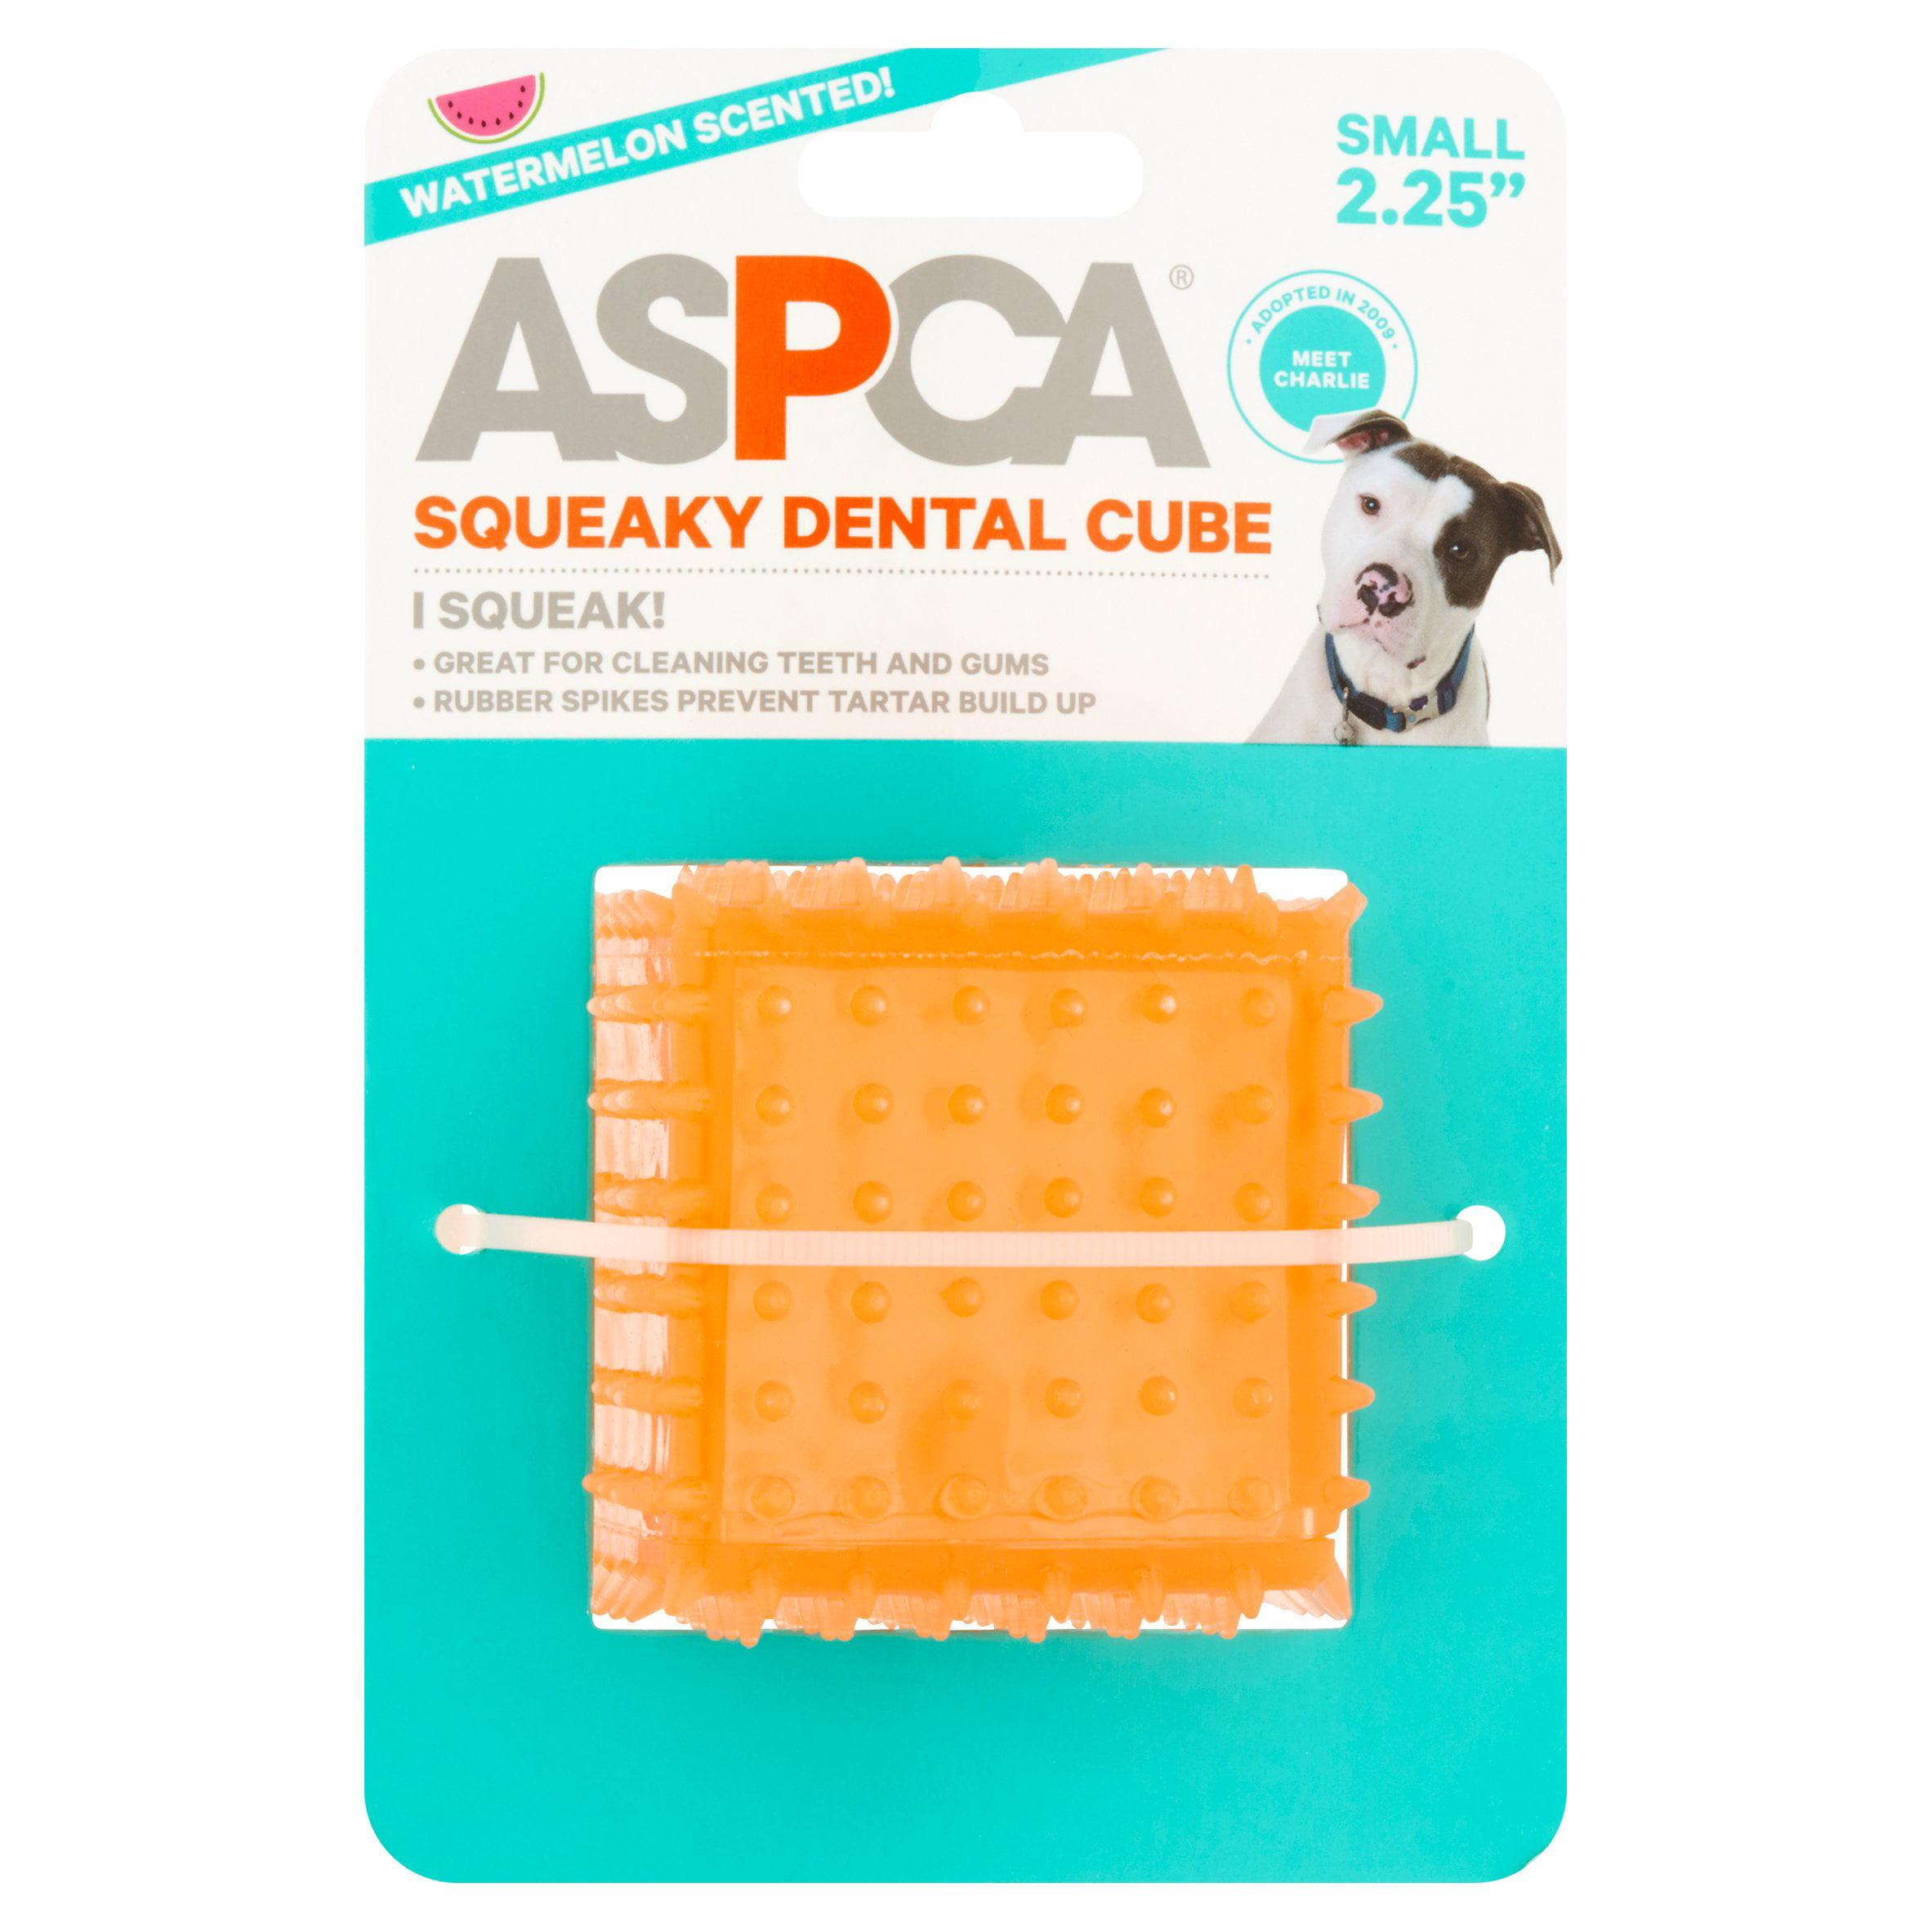 "ASPCA Small 2.25"" Pink Squeaky Dental Cube"